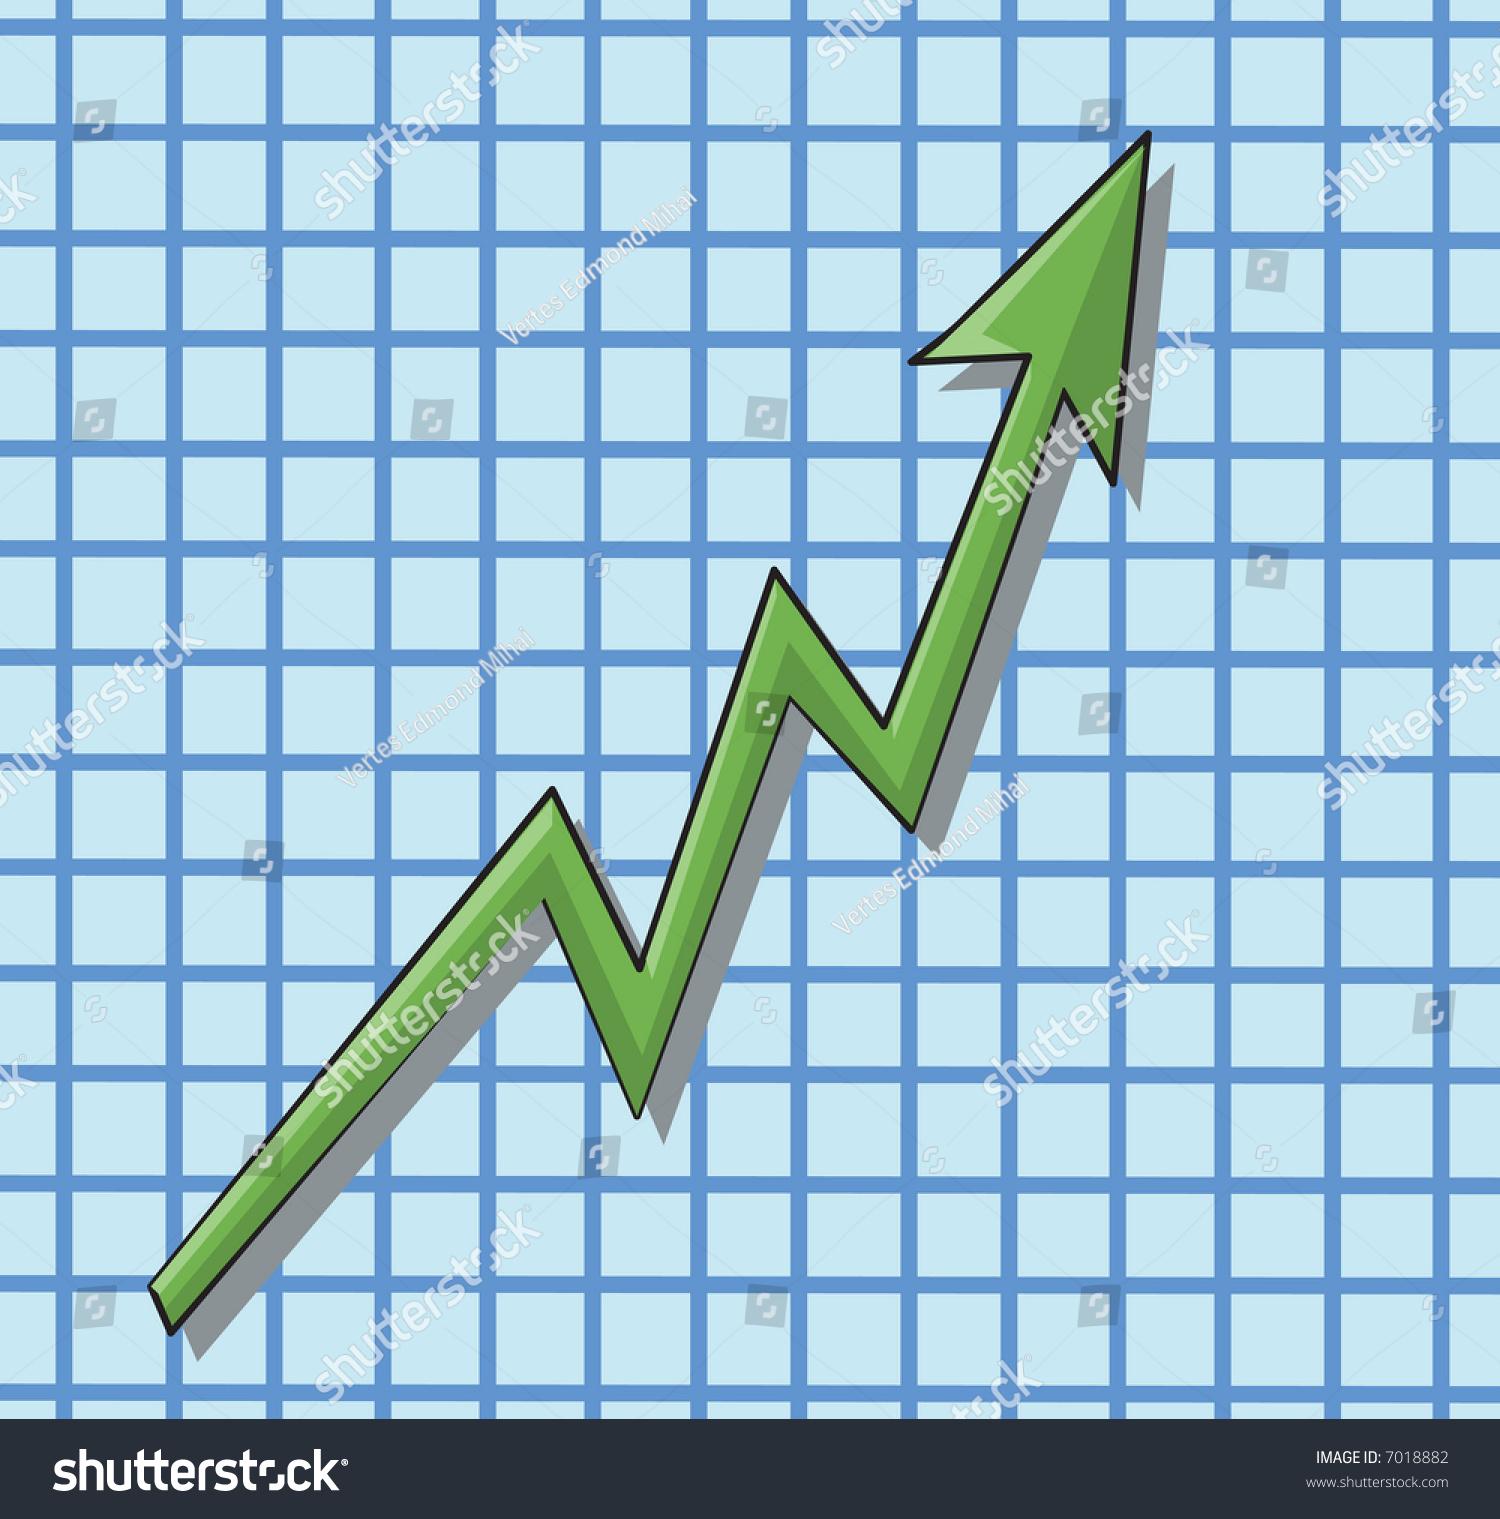 profit loss chart stock illustration 7018882 shutterstock